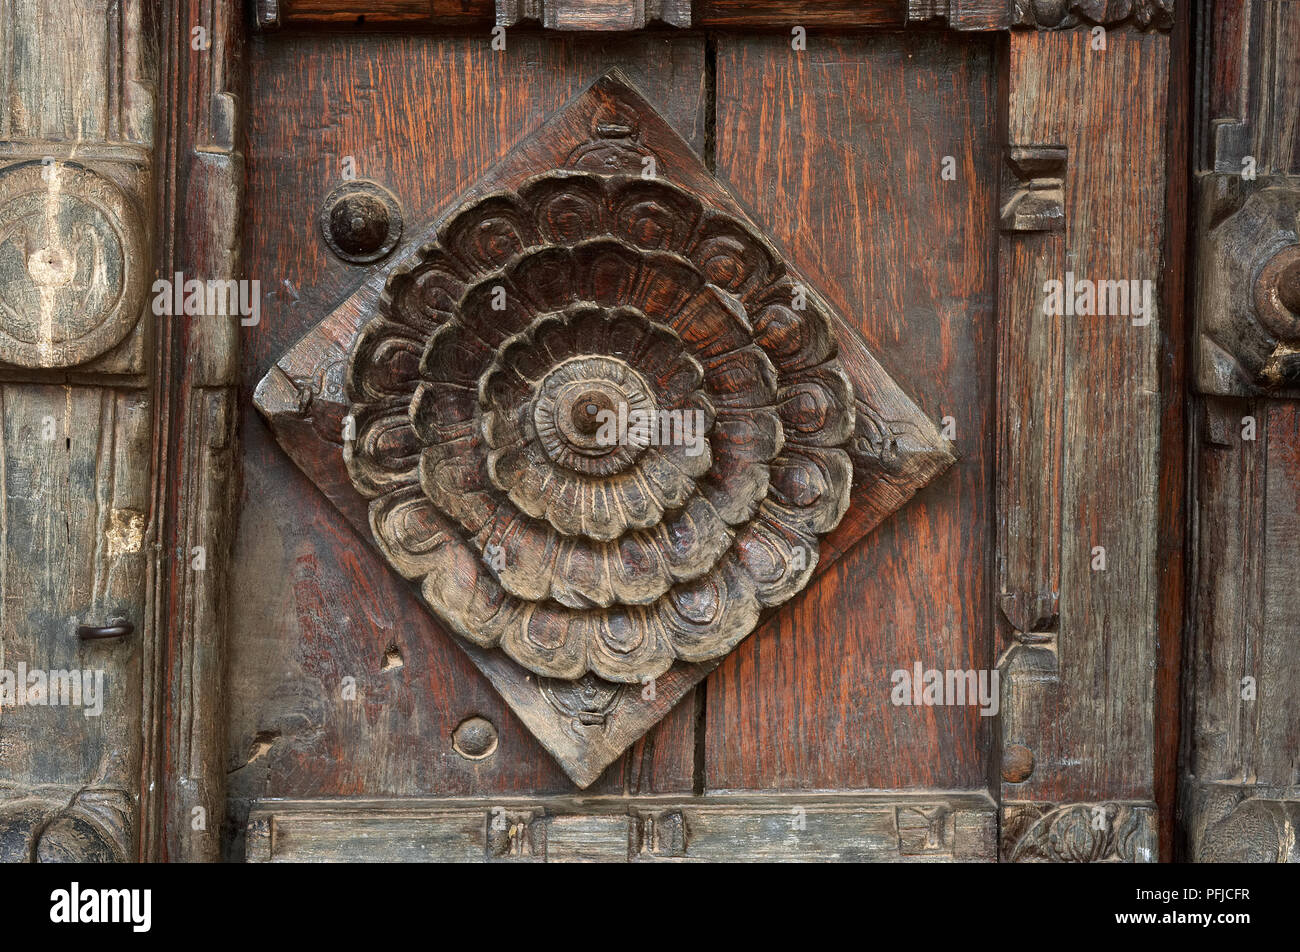 India, Tamil Nadu, Padmanabhapuram, royal palace, woodwork on main gate showing stylised lotus motif, close-up - Stock Image